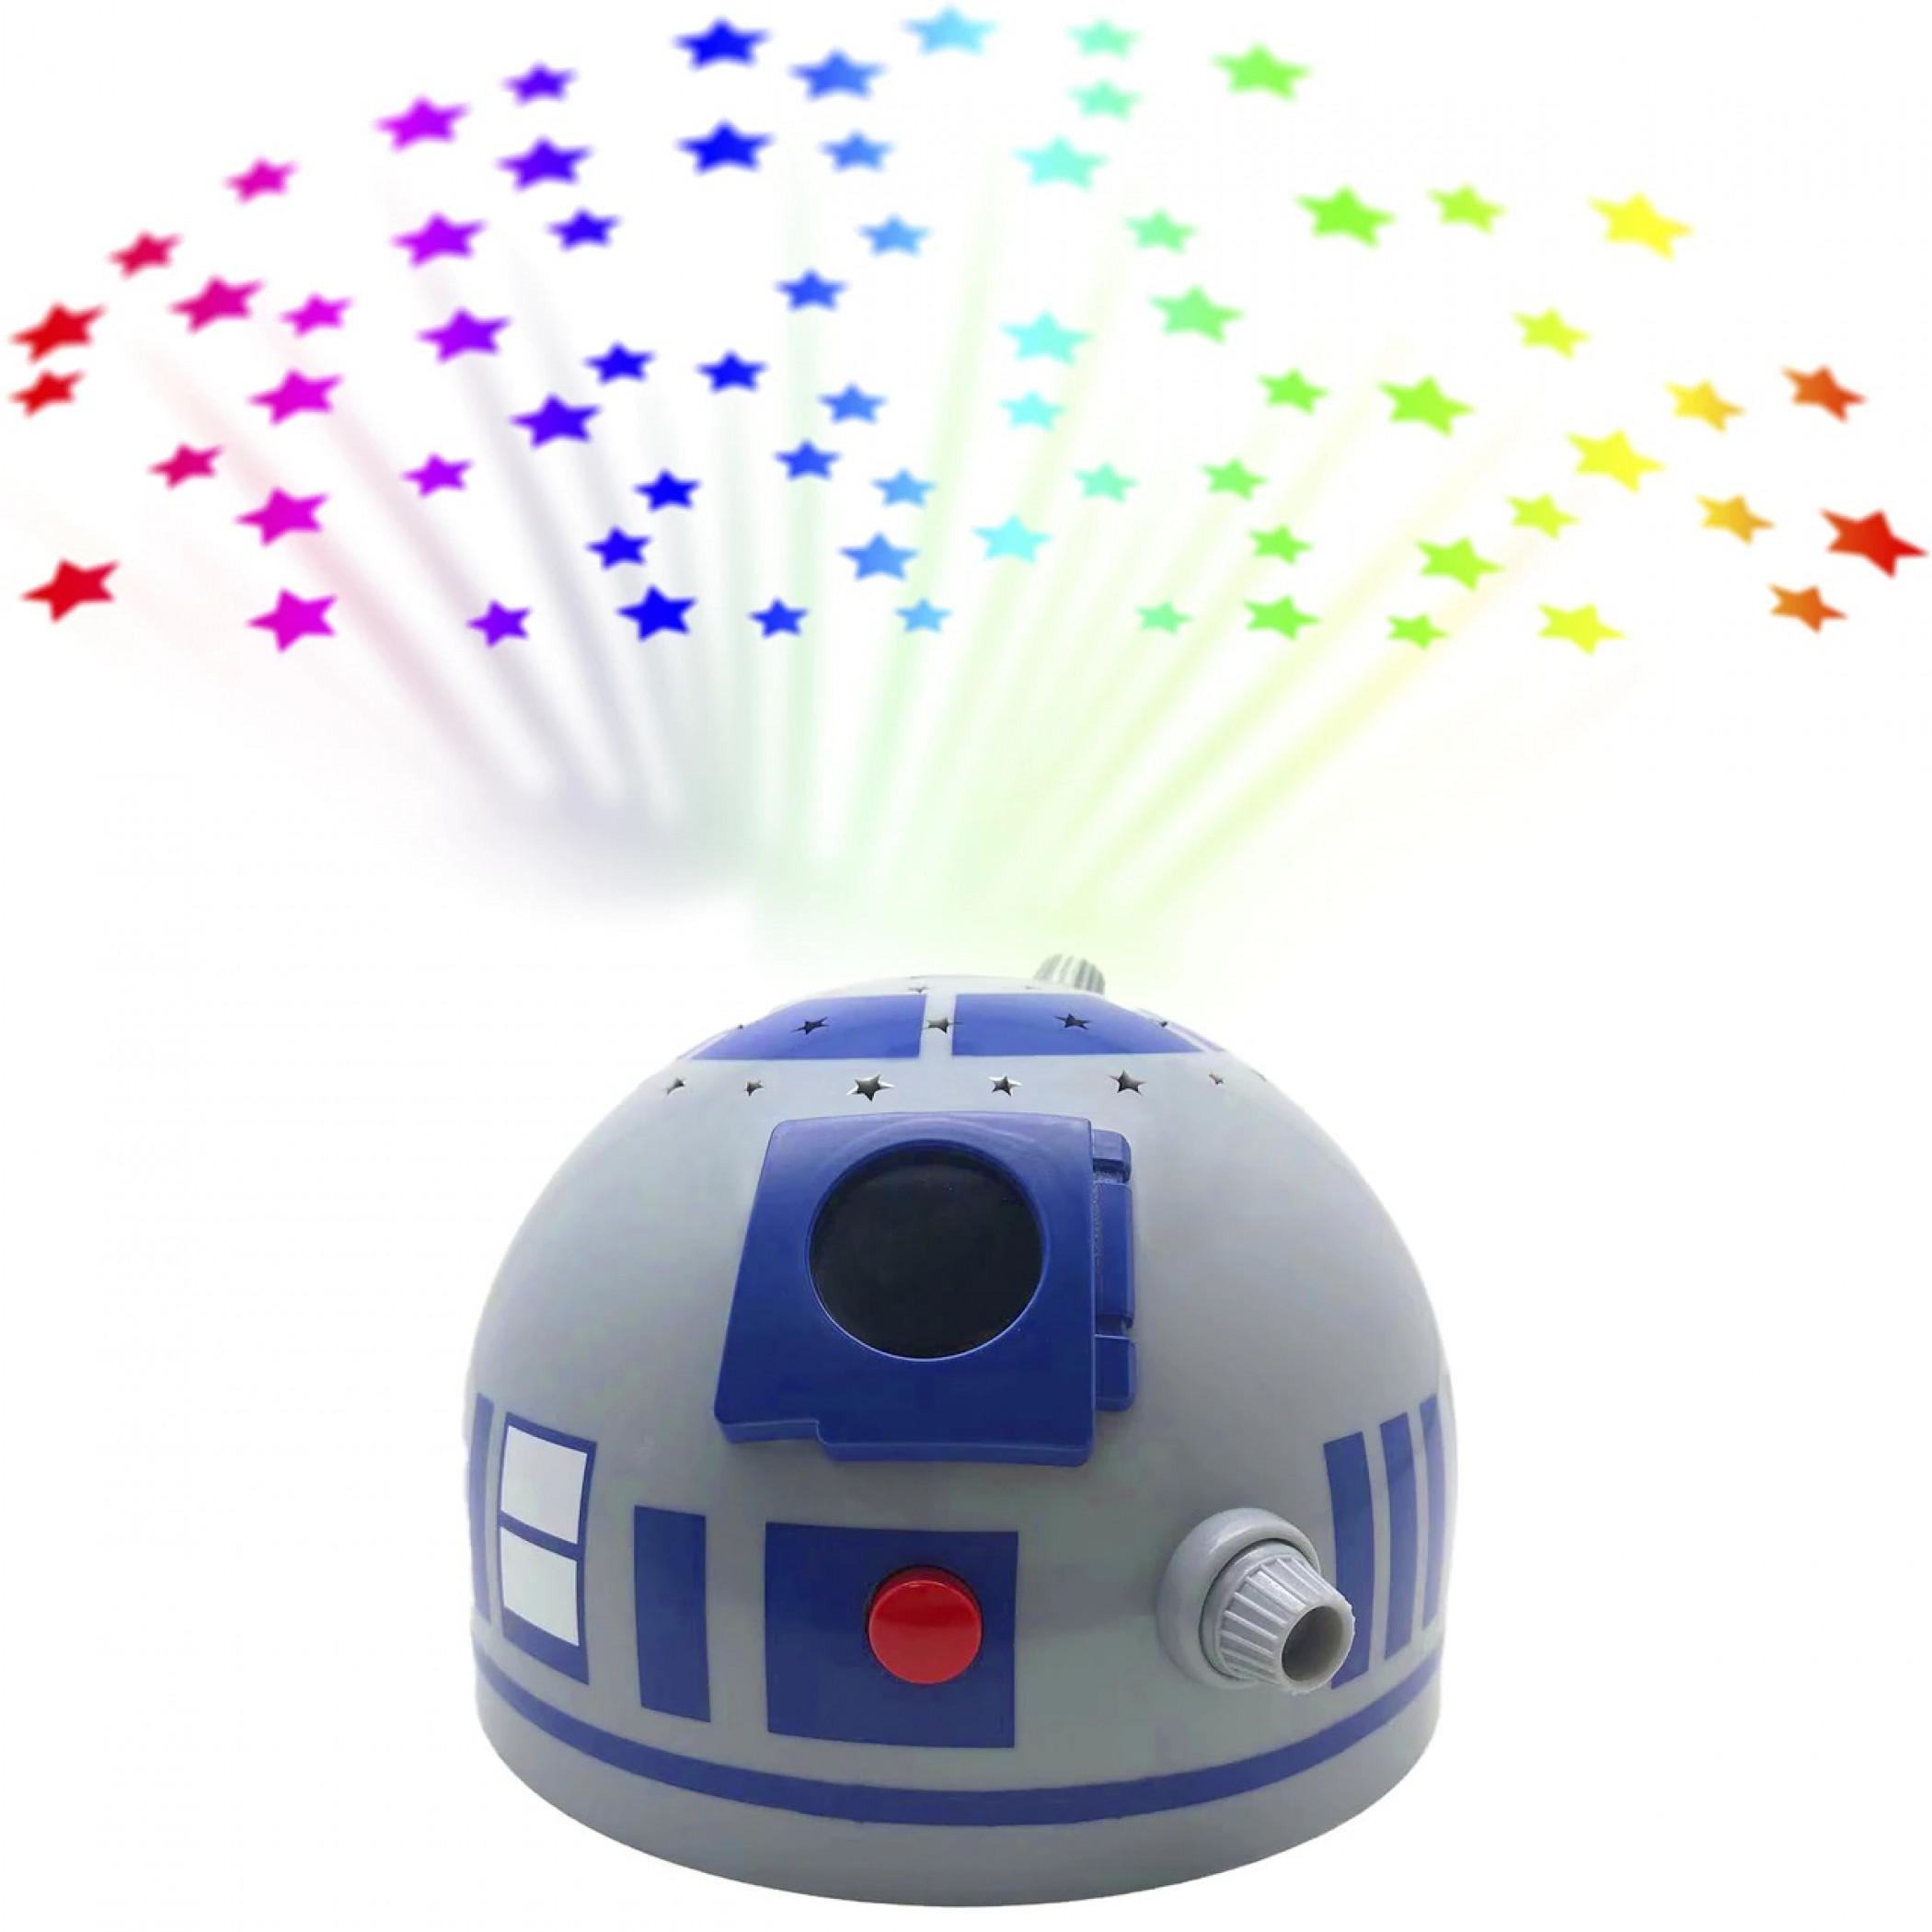 Star Wars R2-D2 Night Light